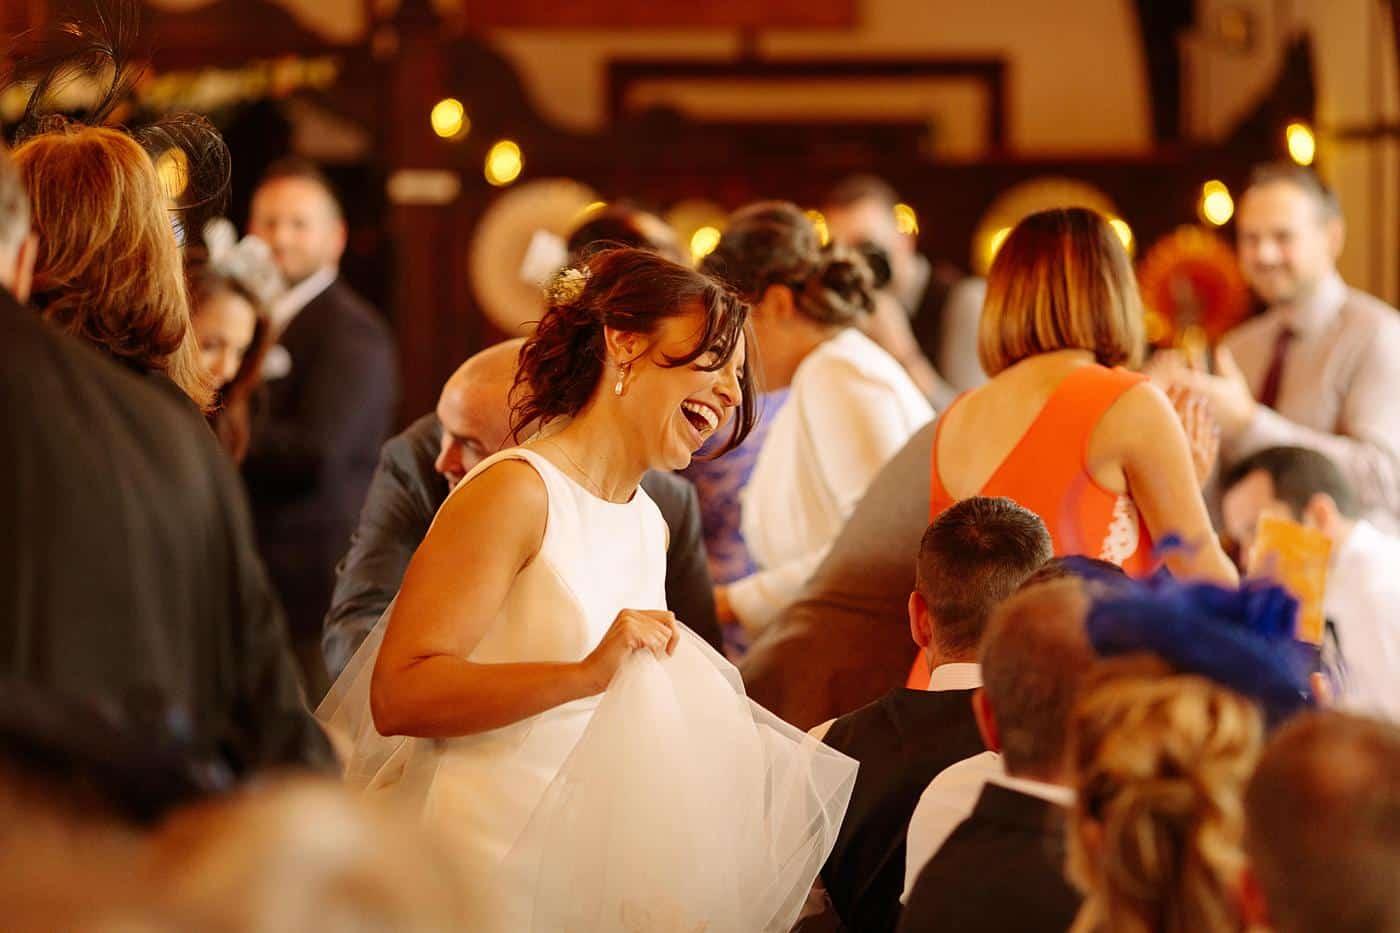 Winstanstow wedding photography 0787